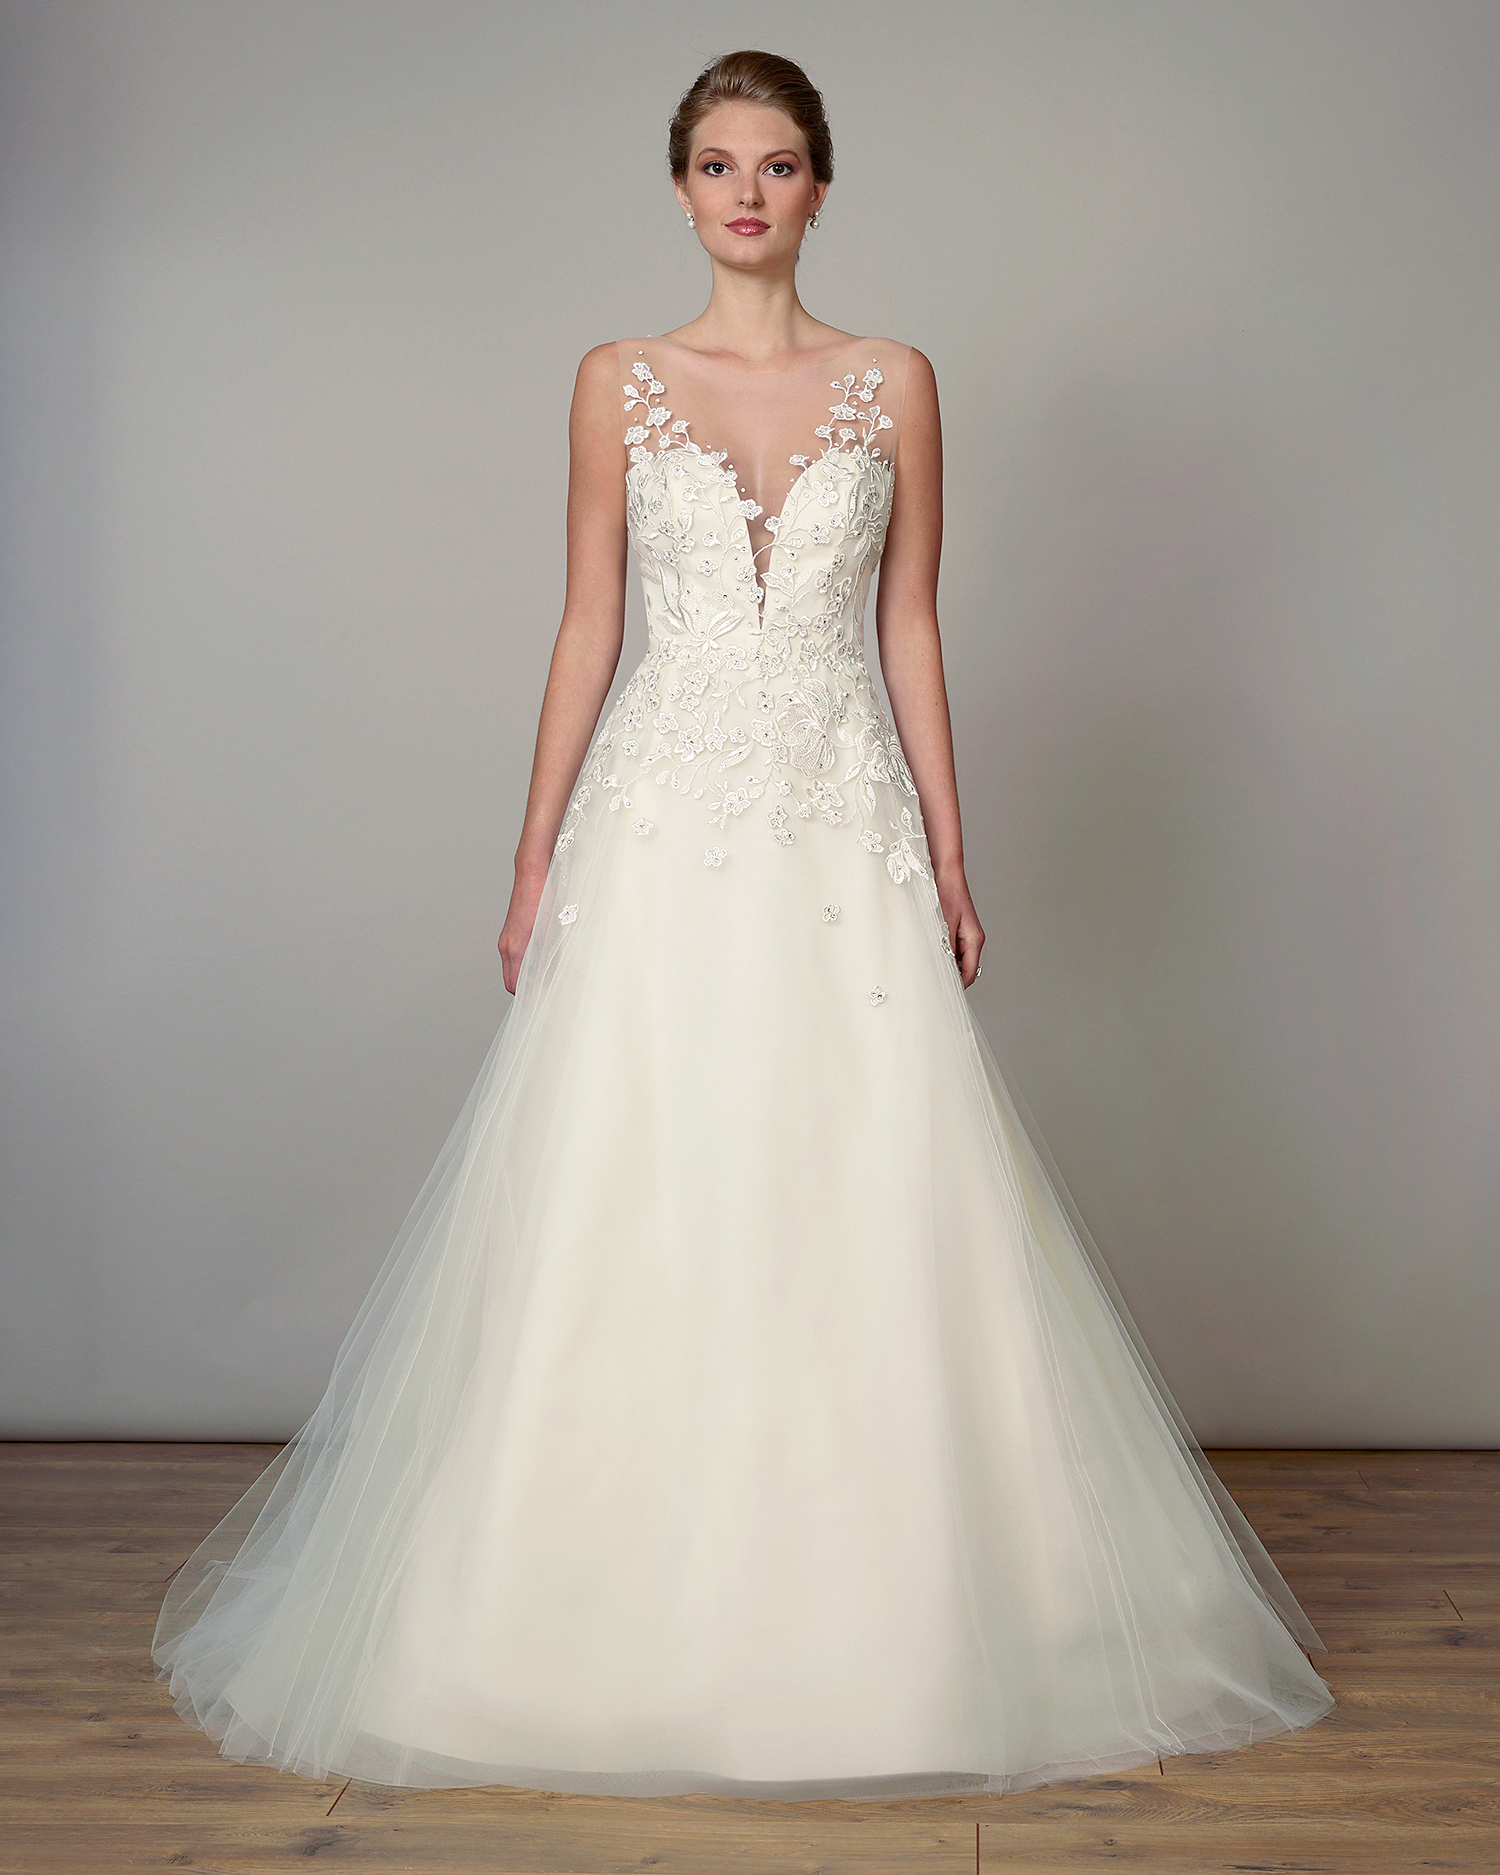 liancarlo wedding dress spring 2019 illusion neck applique a-line